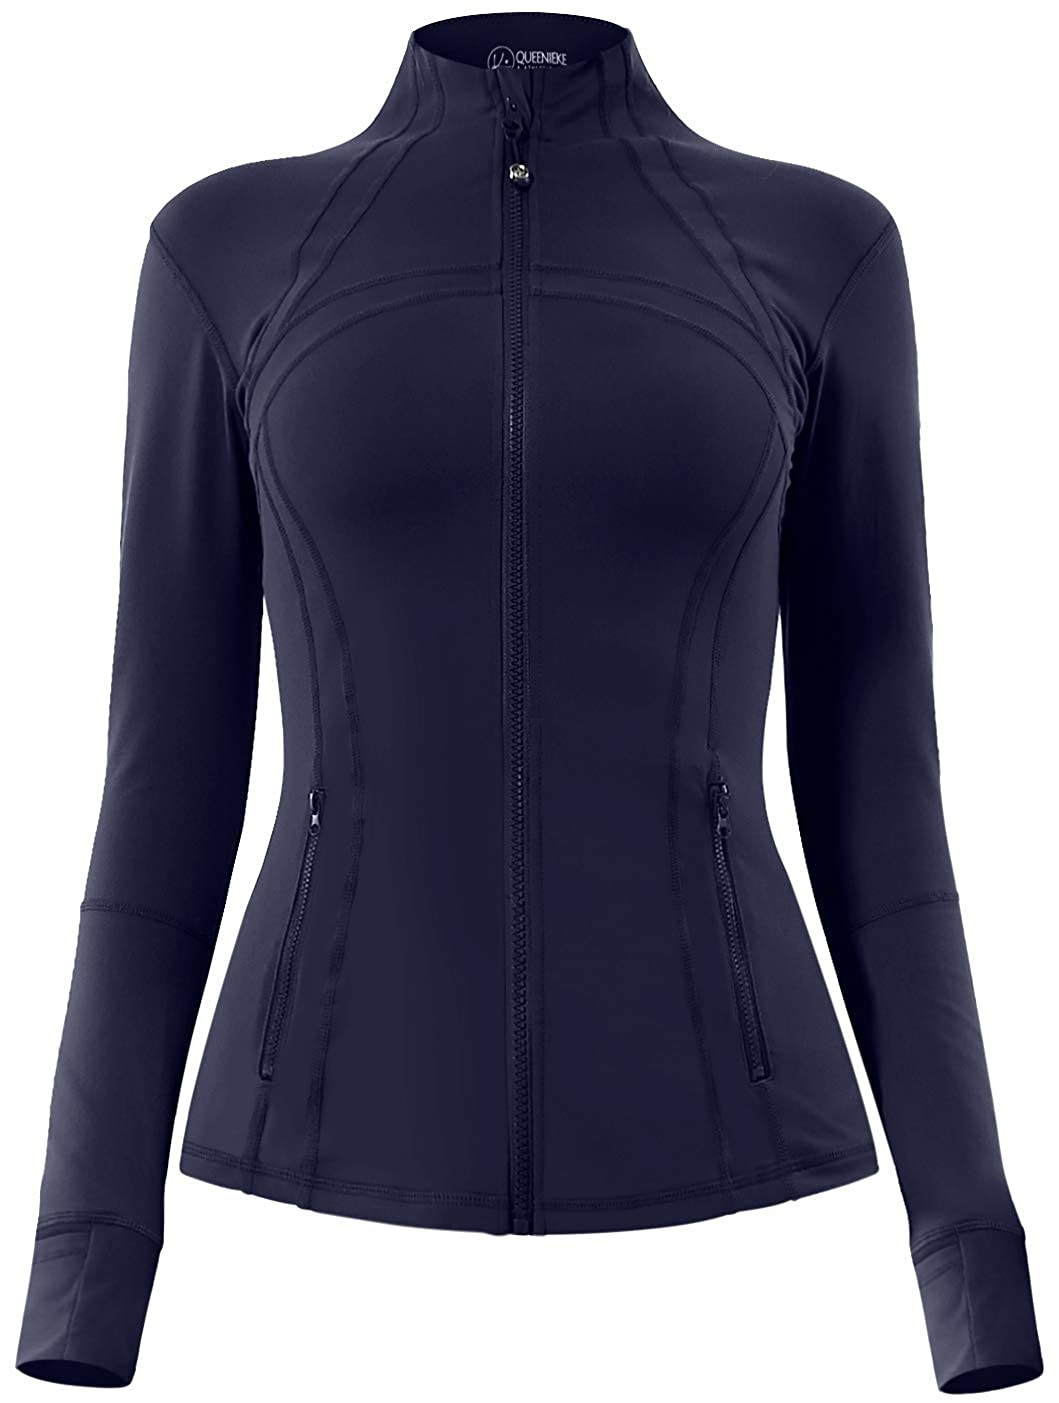 Queenie Ke Damen Sports Jacke Slim Fit Full-Zip Daumenlöcher QK8205JACKET